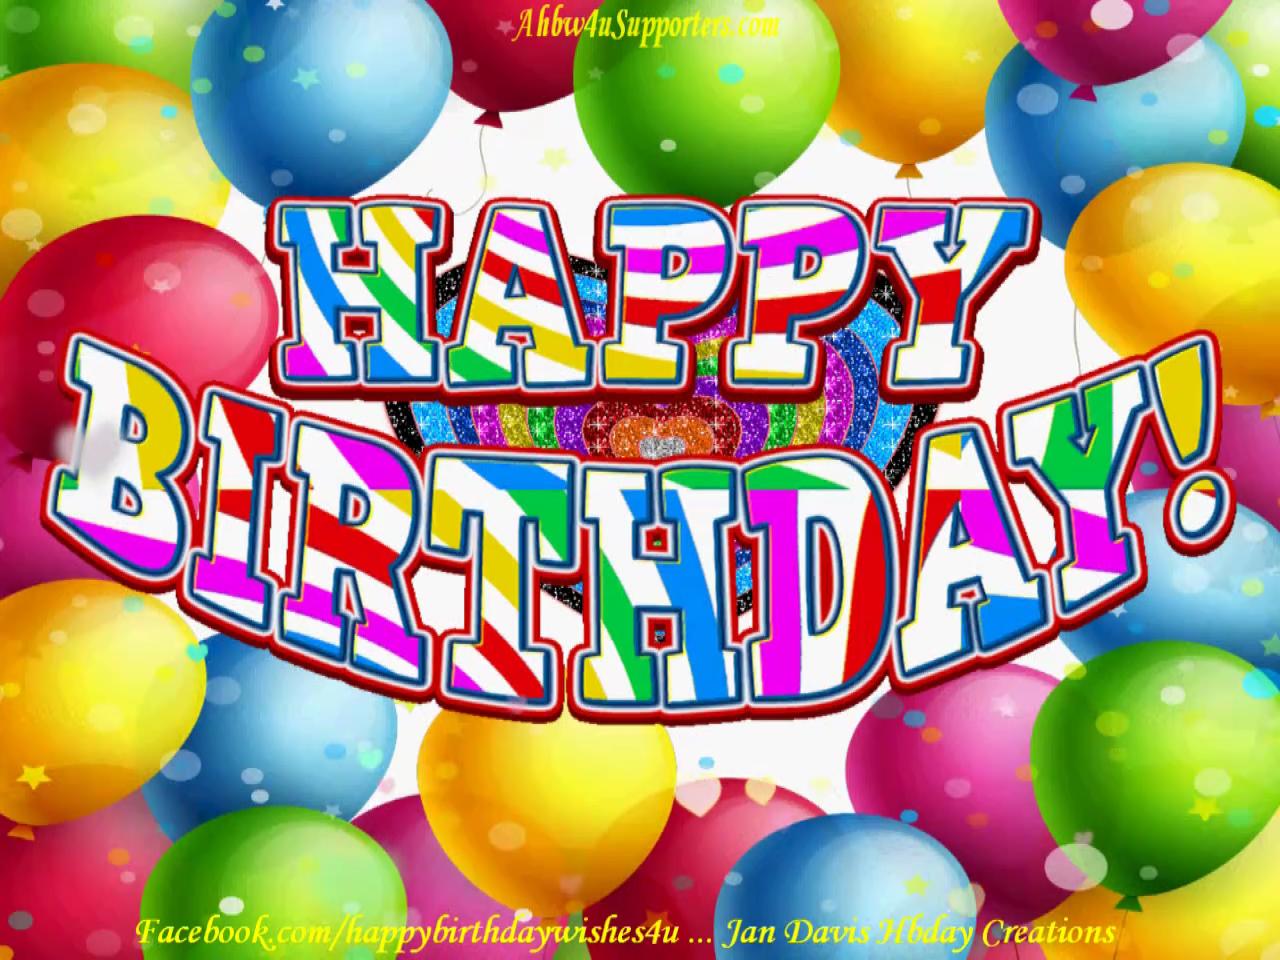 Happy Birthday Http Www Facebook Com Happybirthdaywishes4u Http